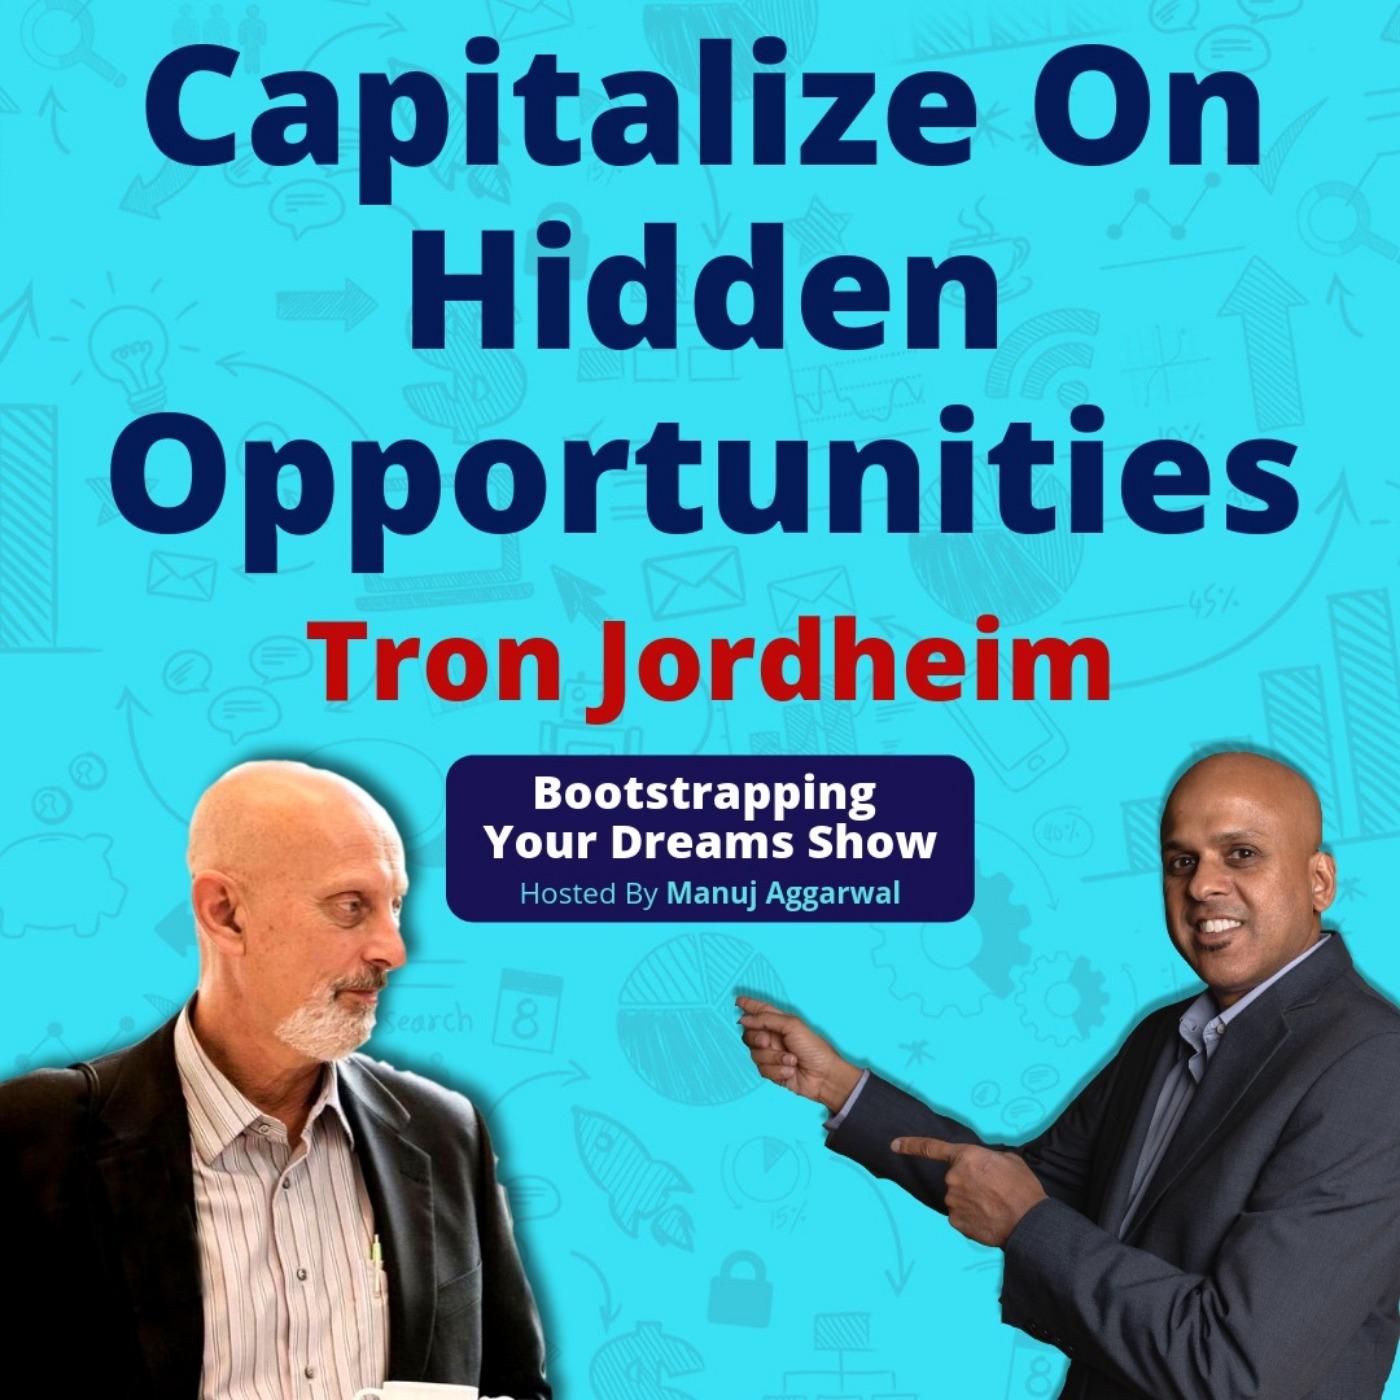 086 | Unique Business Opportunities In Real Estate | Capitalize On Hidden Opportunities | Tron Jordheim